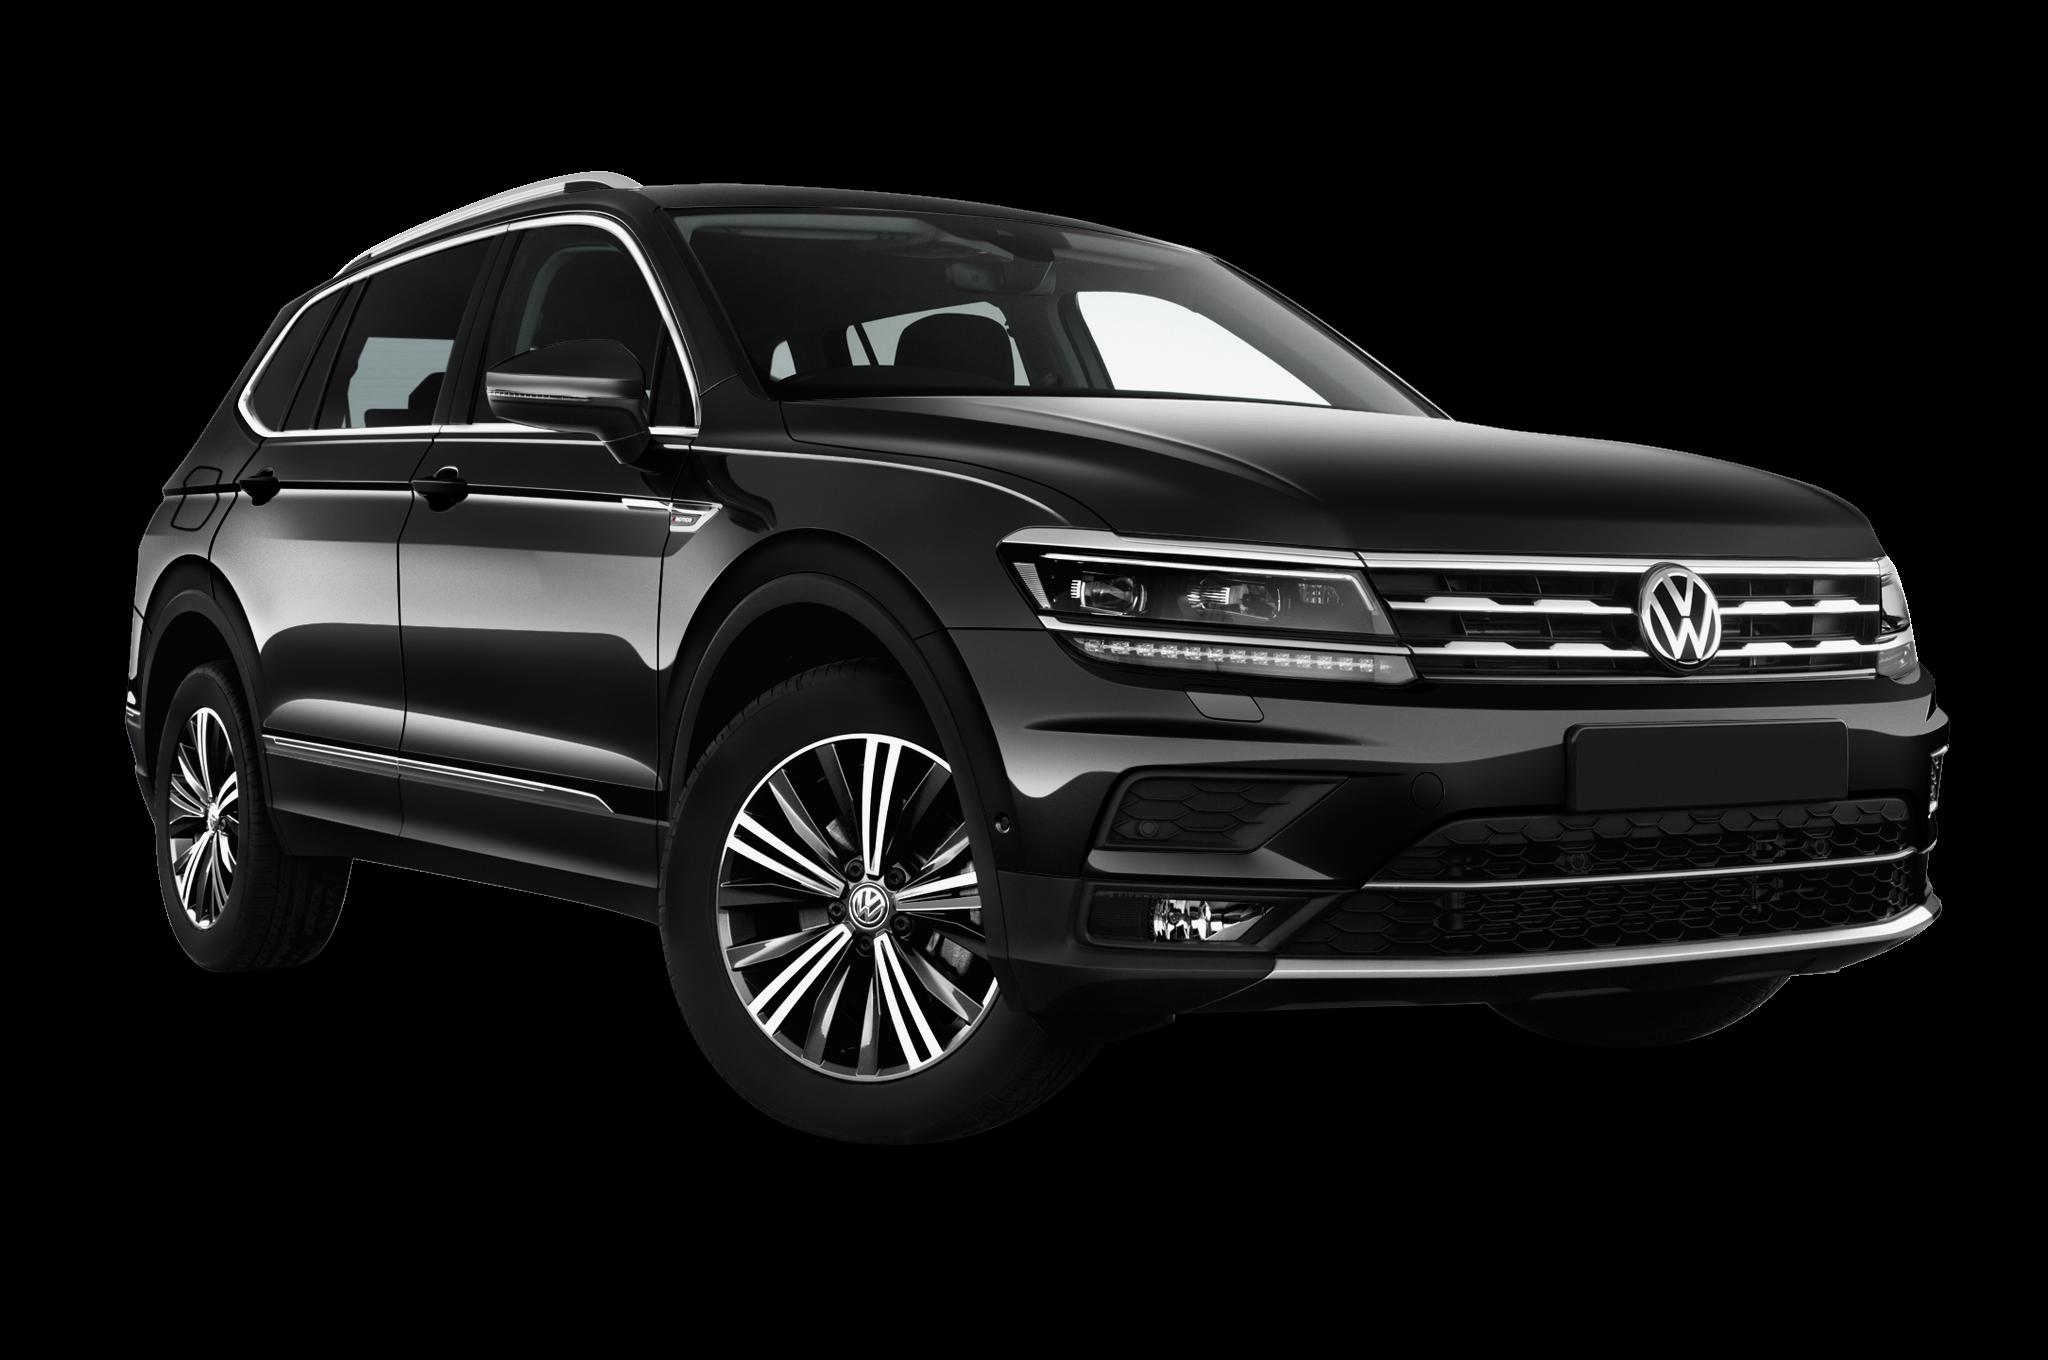 Volkswagen Tiguan Allspace Deals Amp Offers Savings Up To